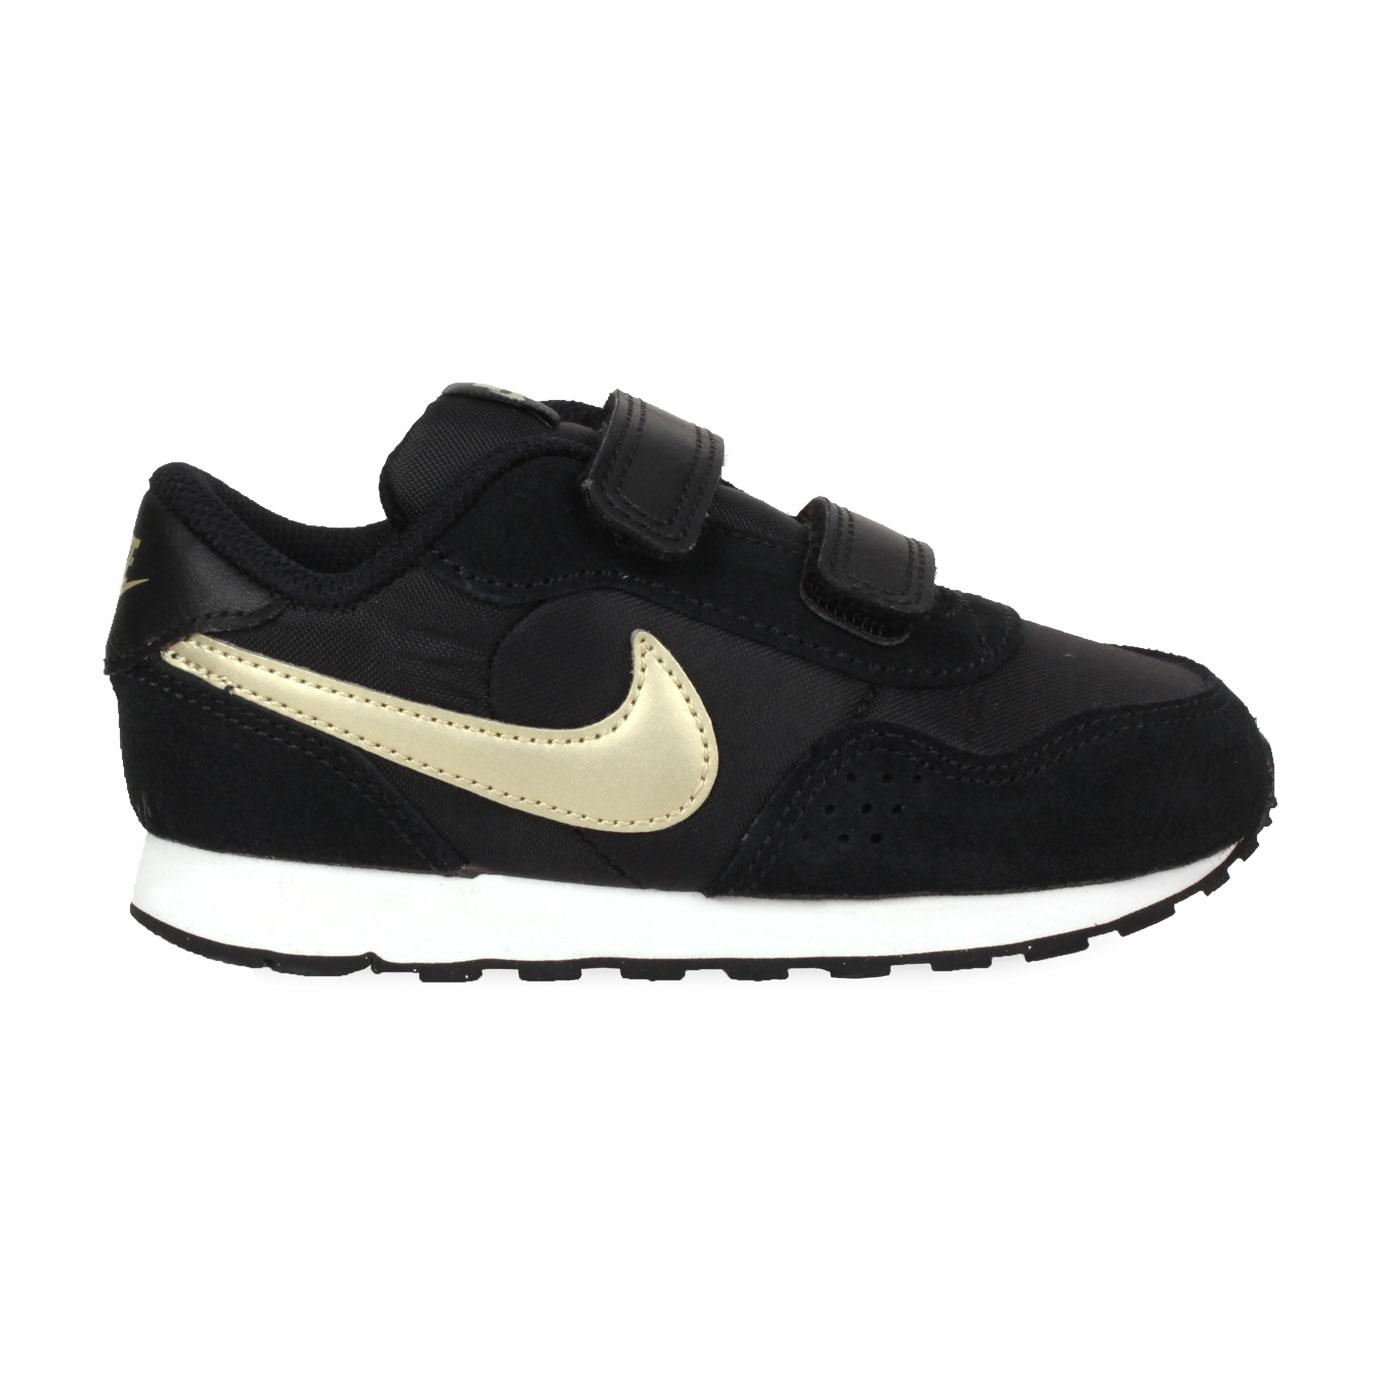 NIKE 小童運動慢跑鞋  @MD VALIANT (TDV)@CN8560009 - 黑香檳金